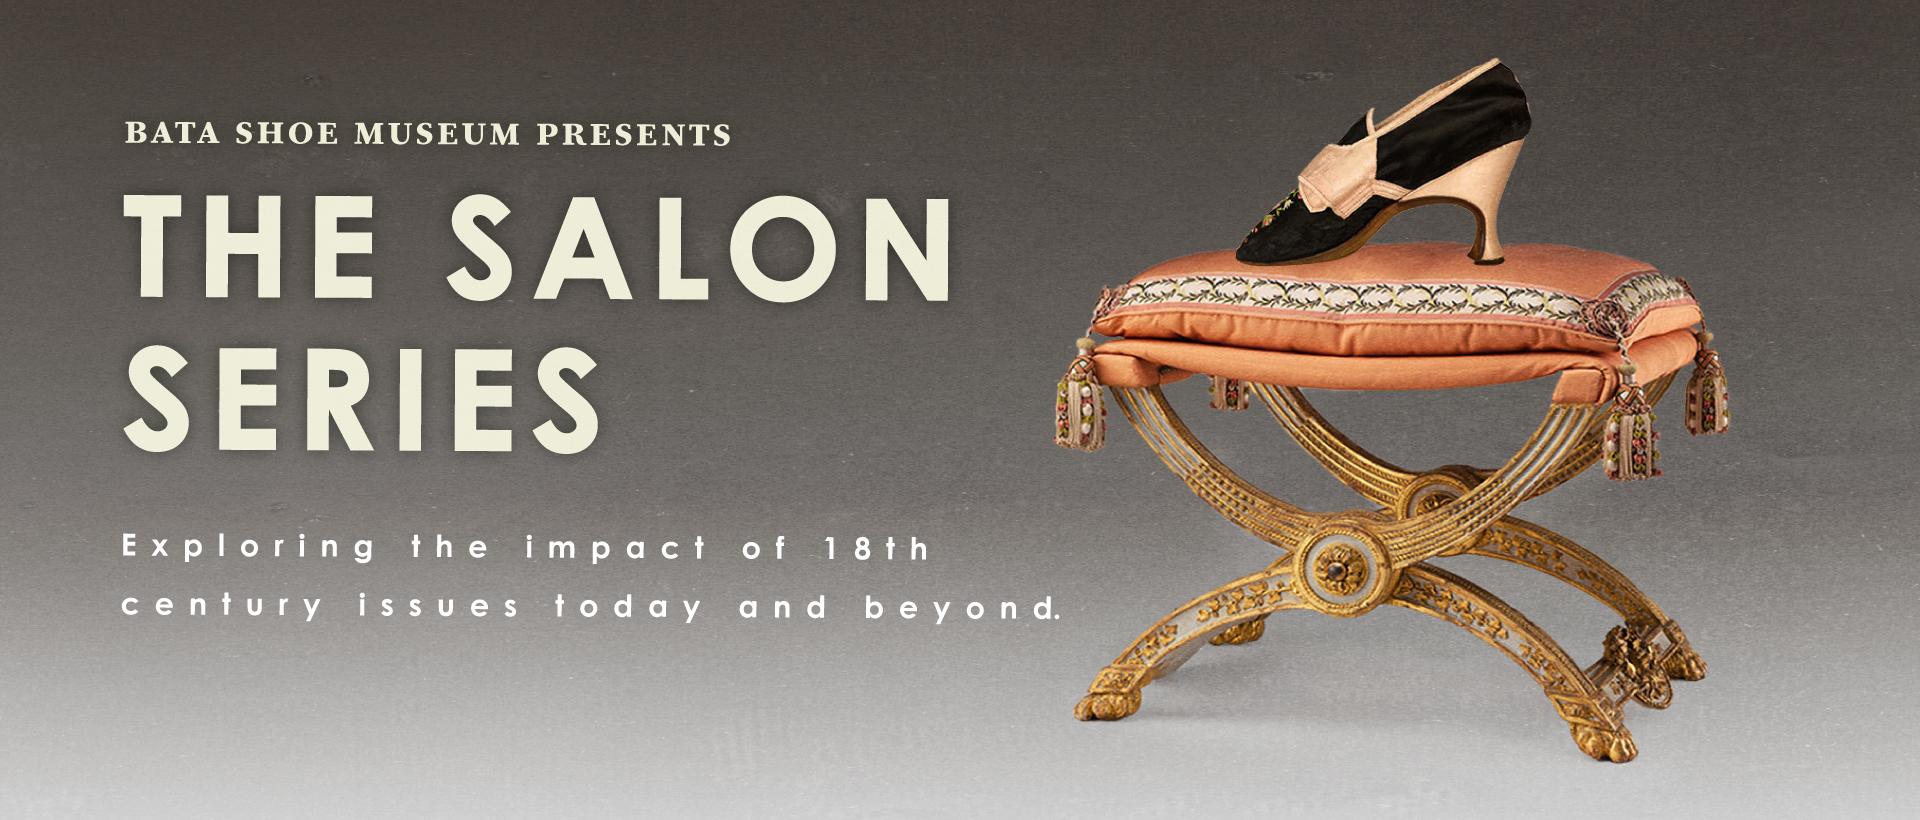 The Salon Series 4